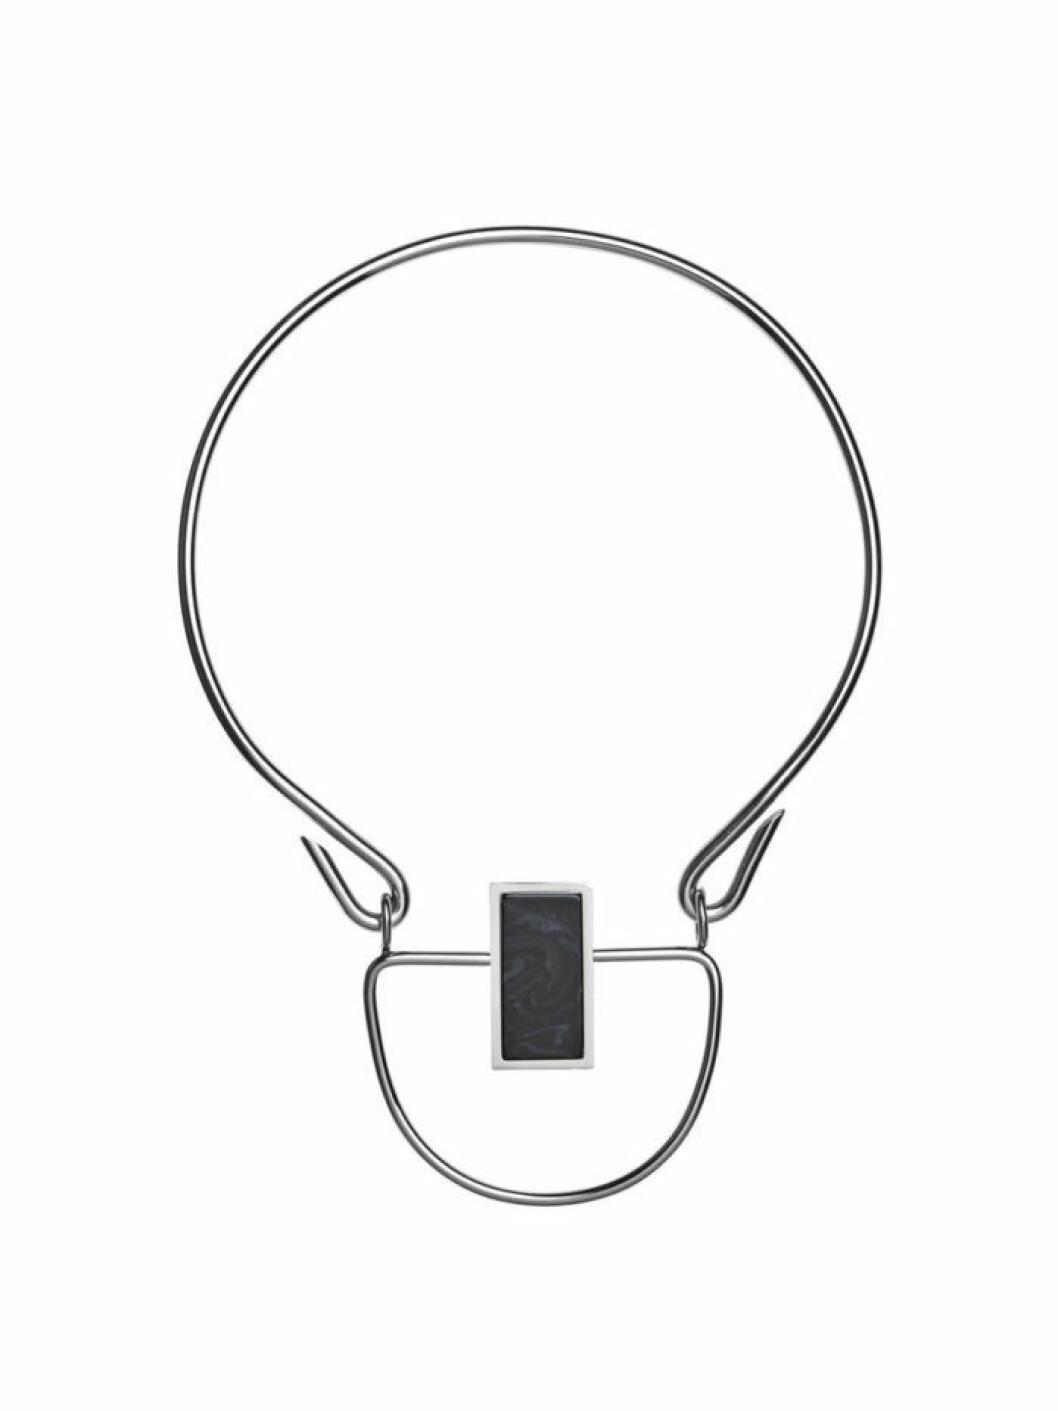 halsband-grafisk-form-by-malene-birger